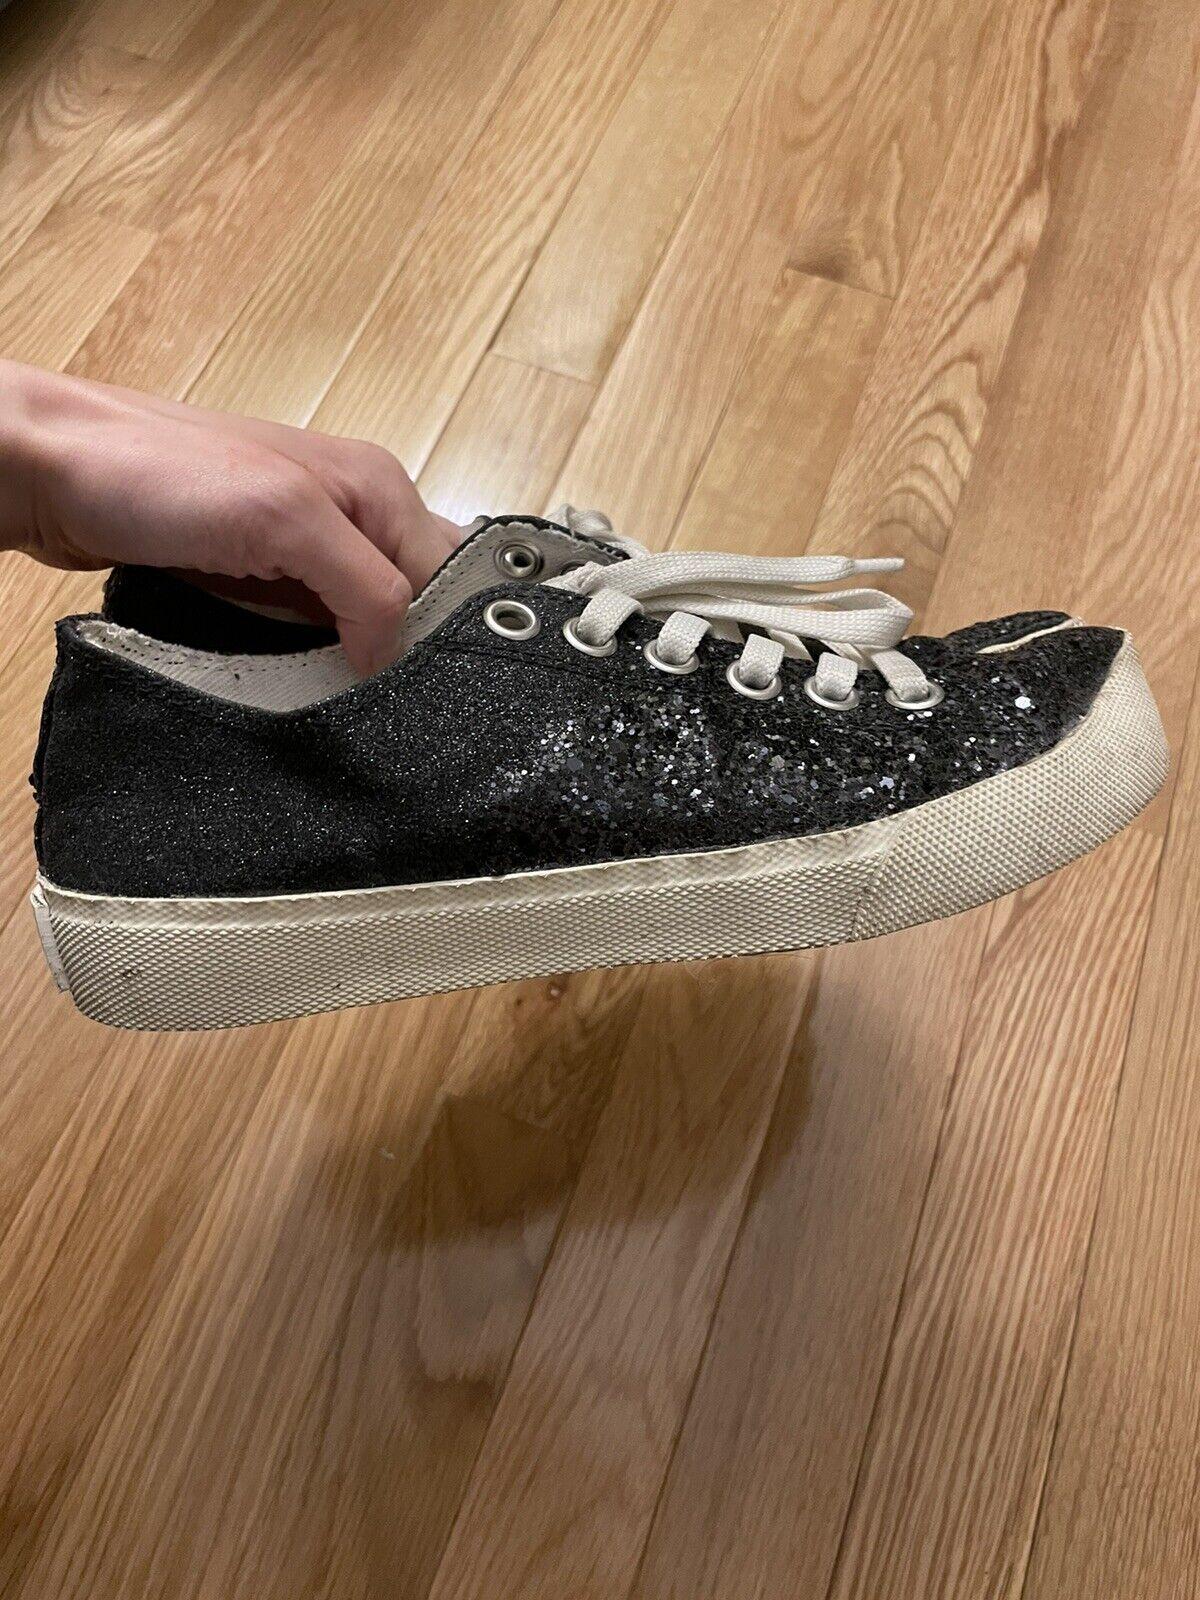 maison martin margiela women's shoes tabi 35 5 - image 1